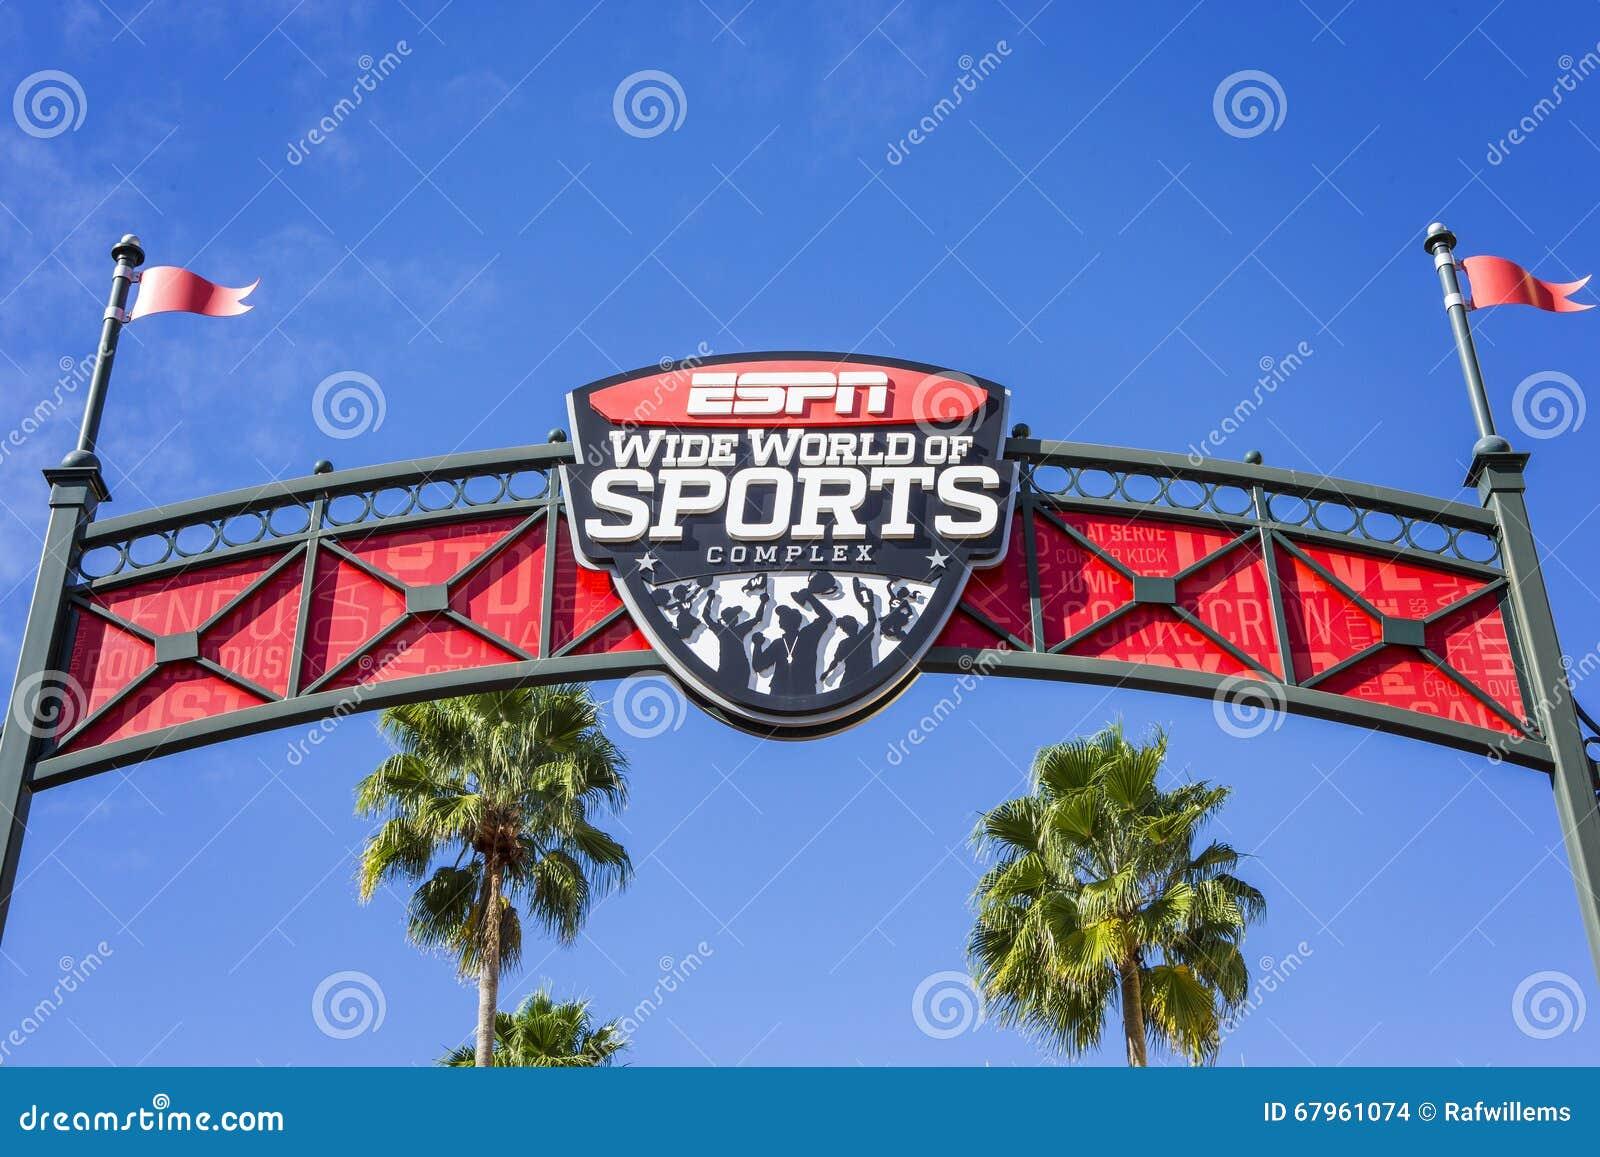 ESPN, Wide World Of Sports, Florida, USA, 4 Jan 2016